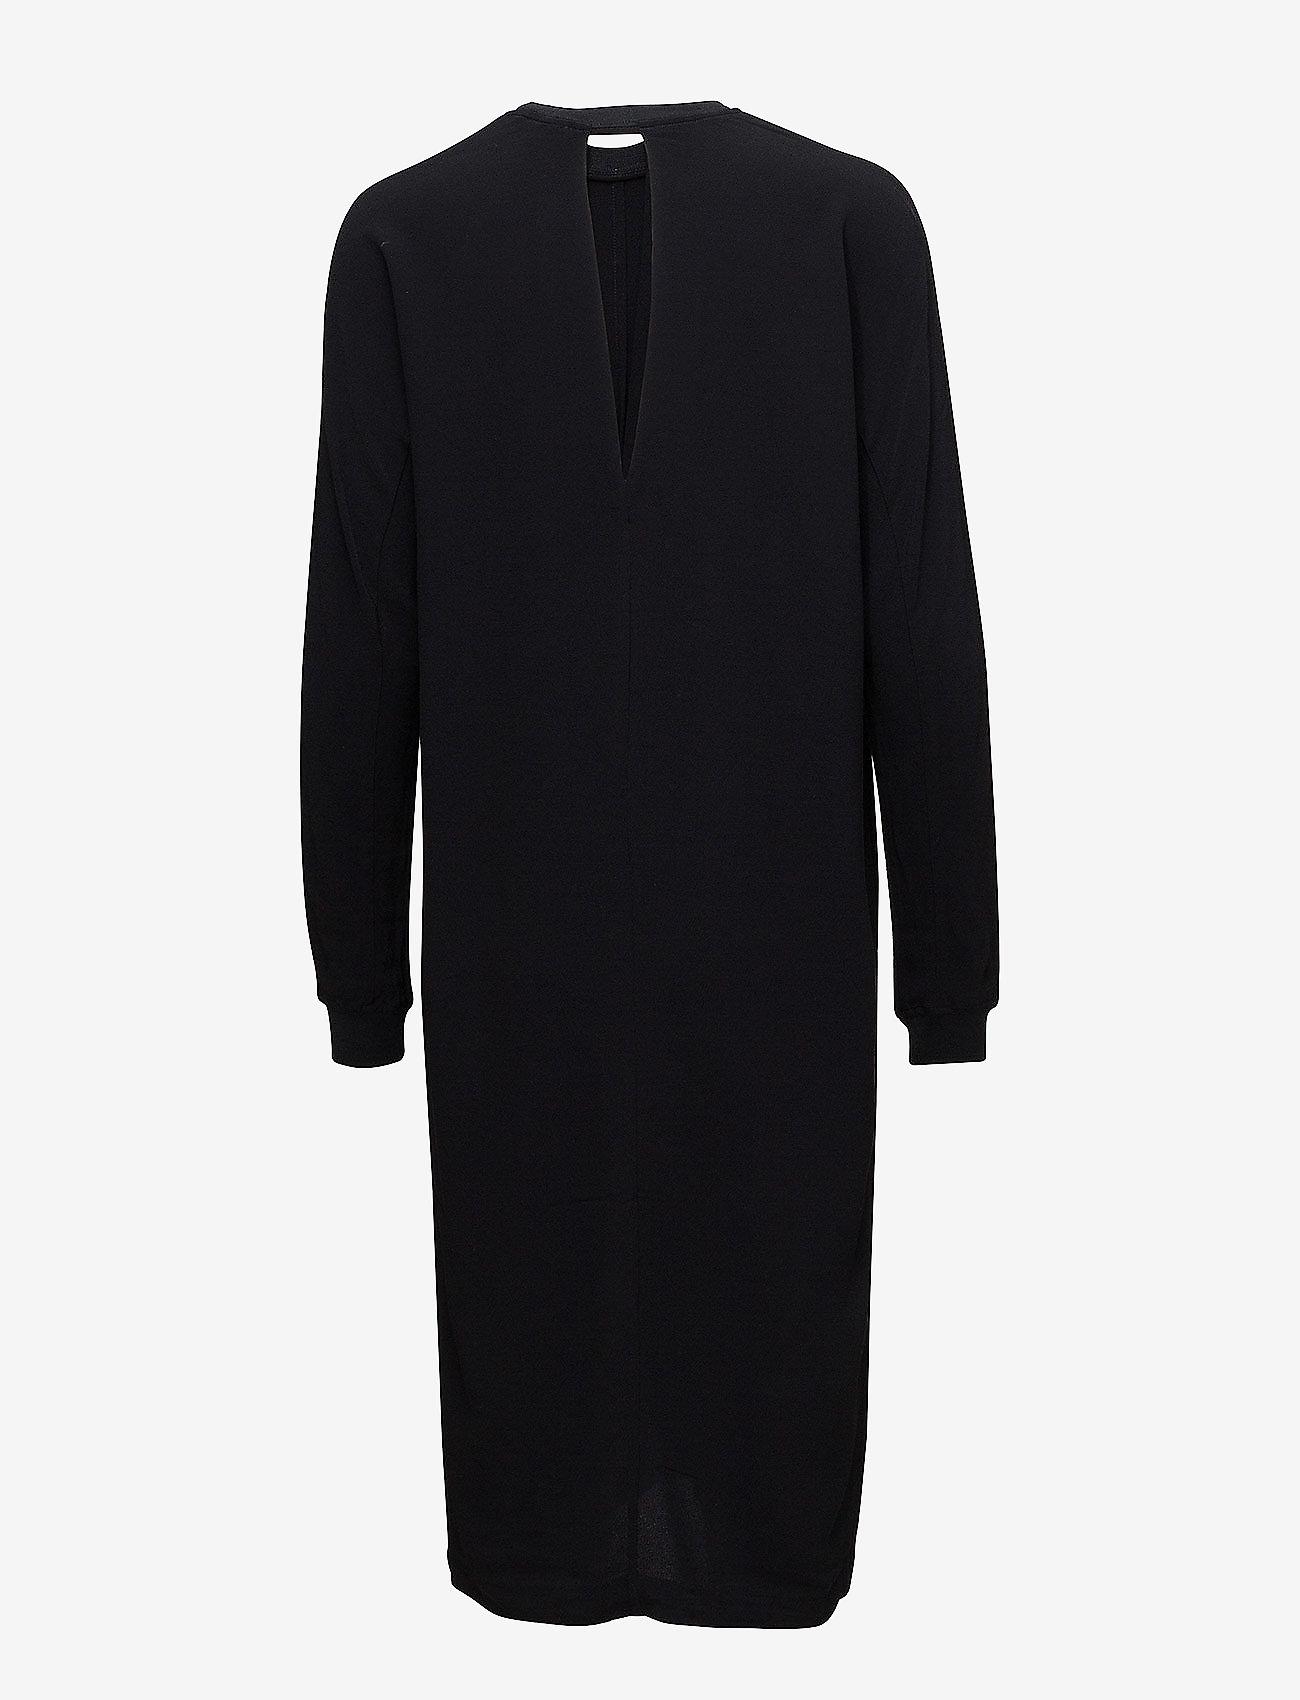 J. Lindeberg Noelle Drapy Crepe - Dresses BLACK